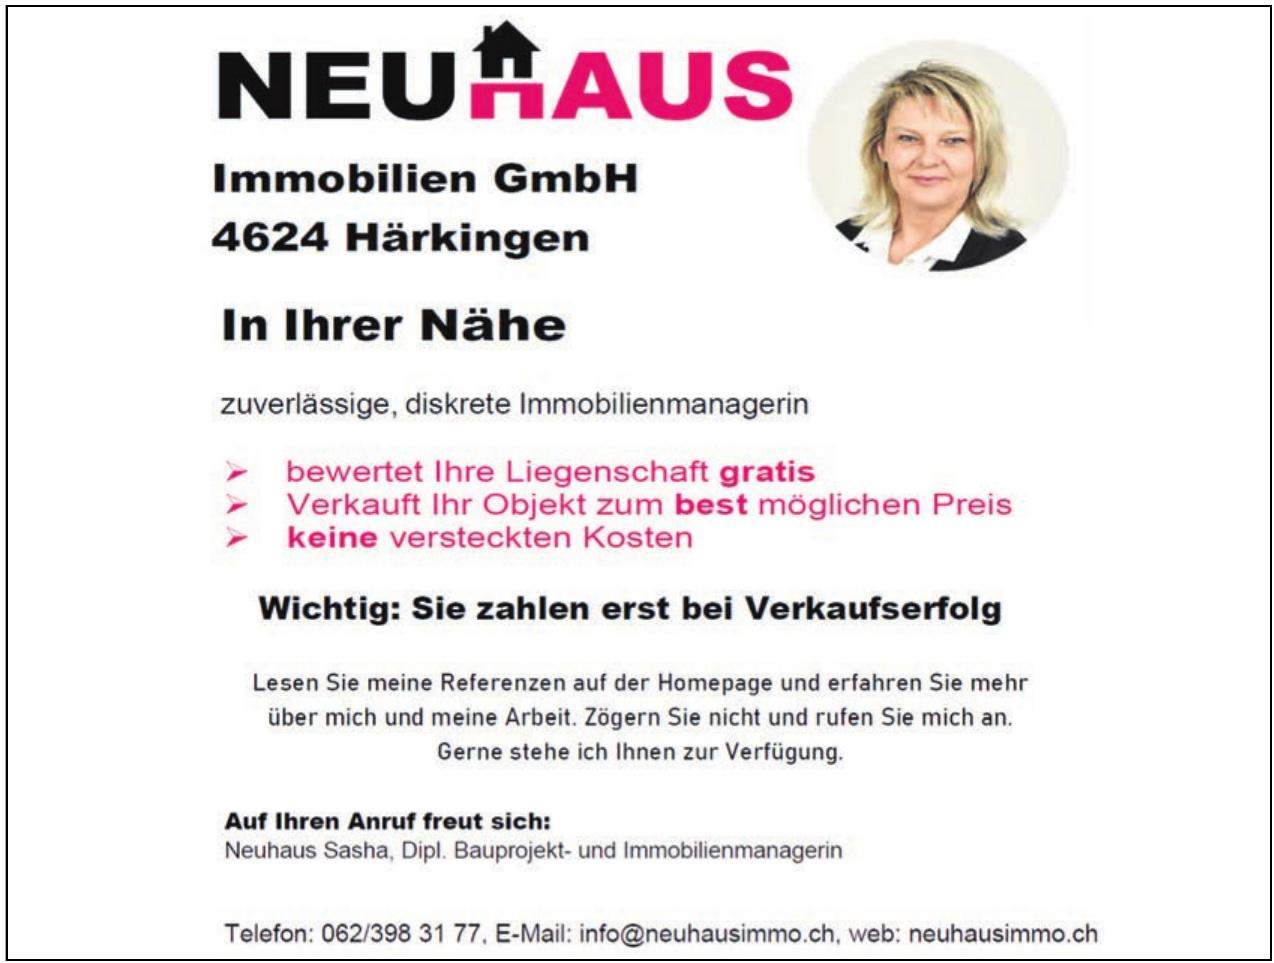 NeuHaus Immobillen GmbH